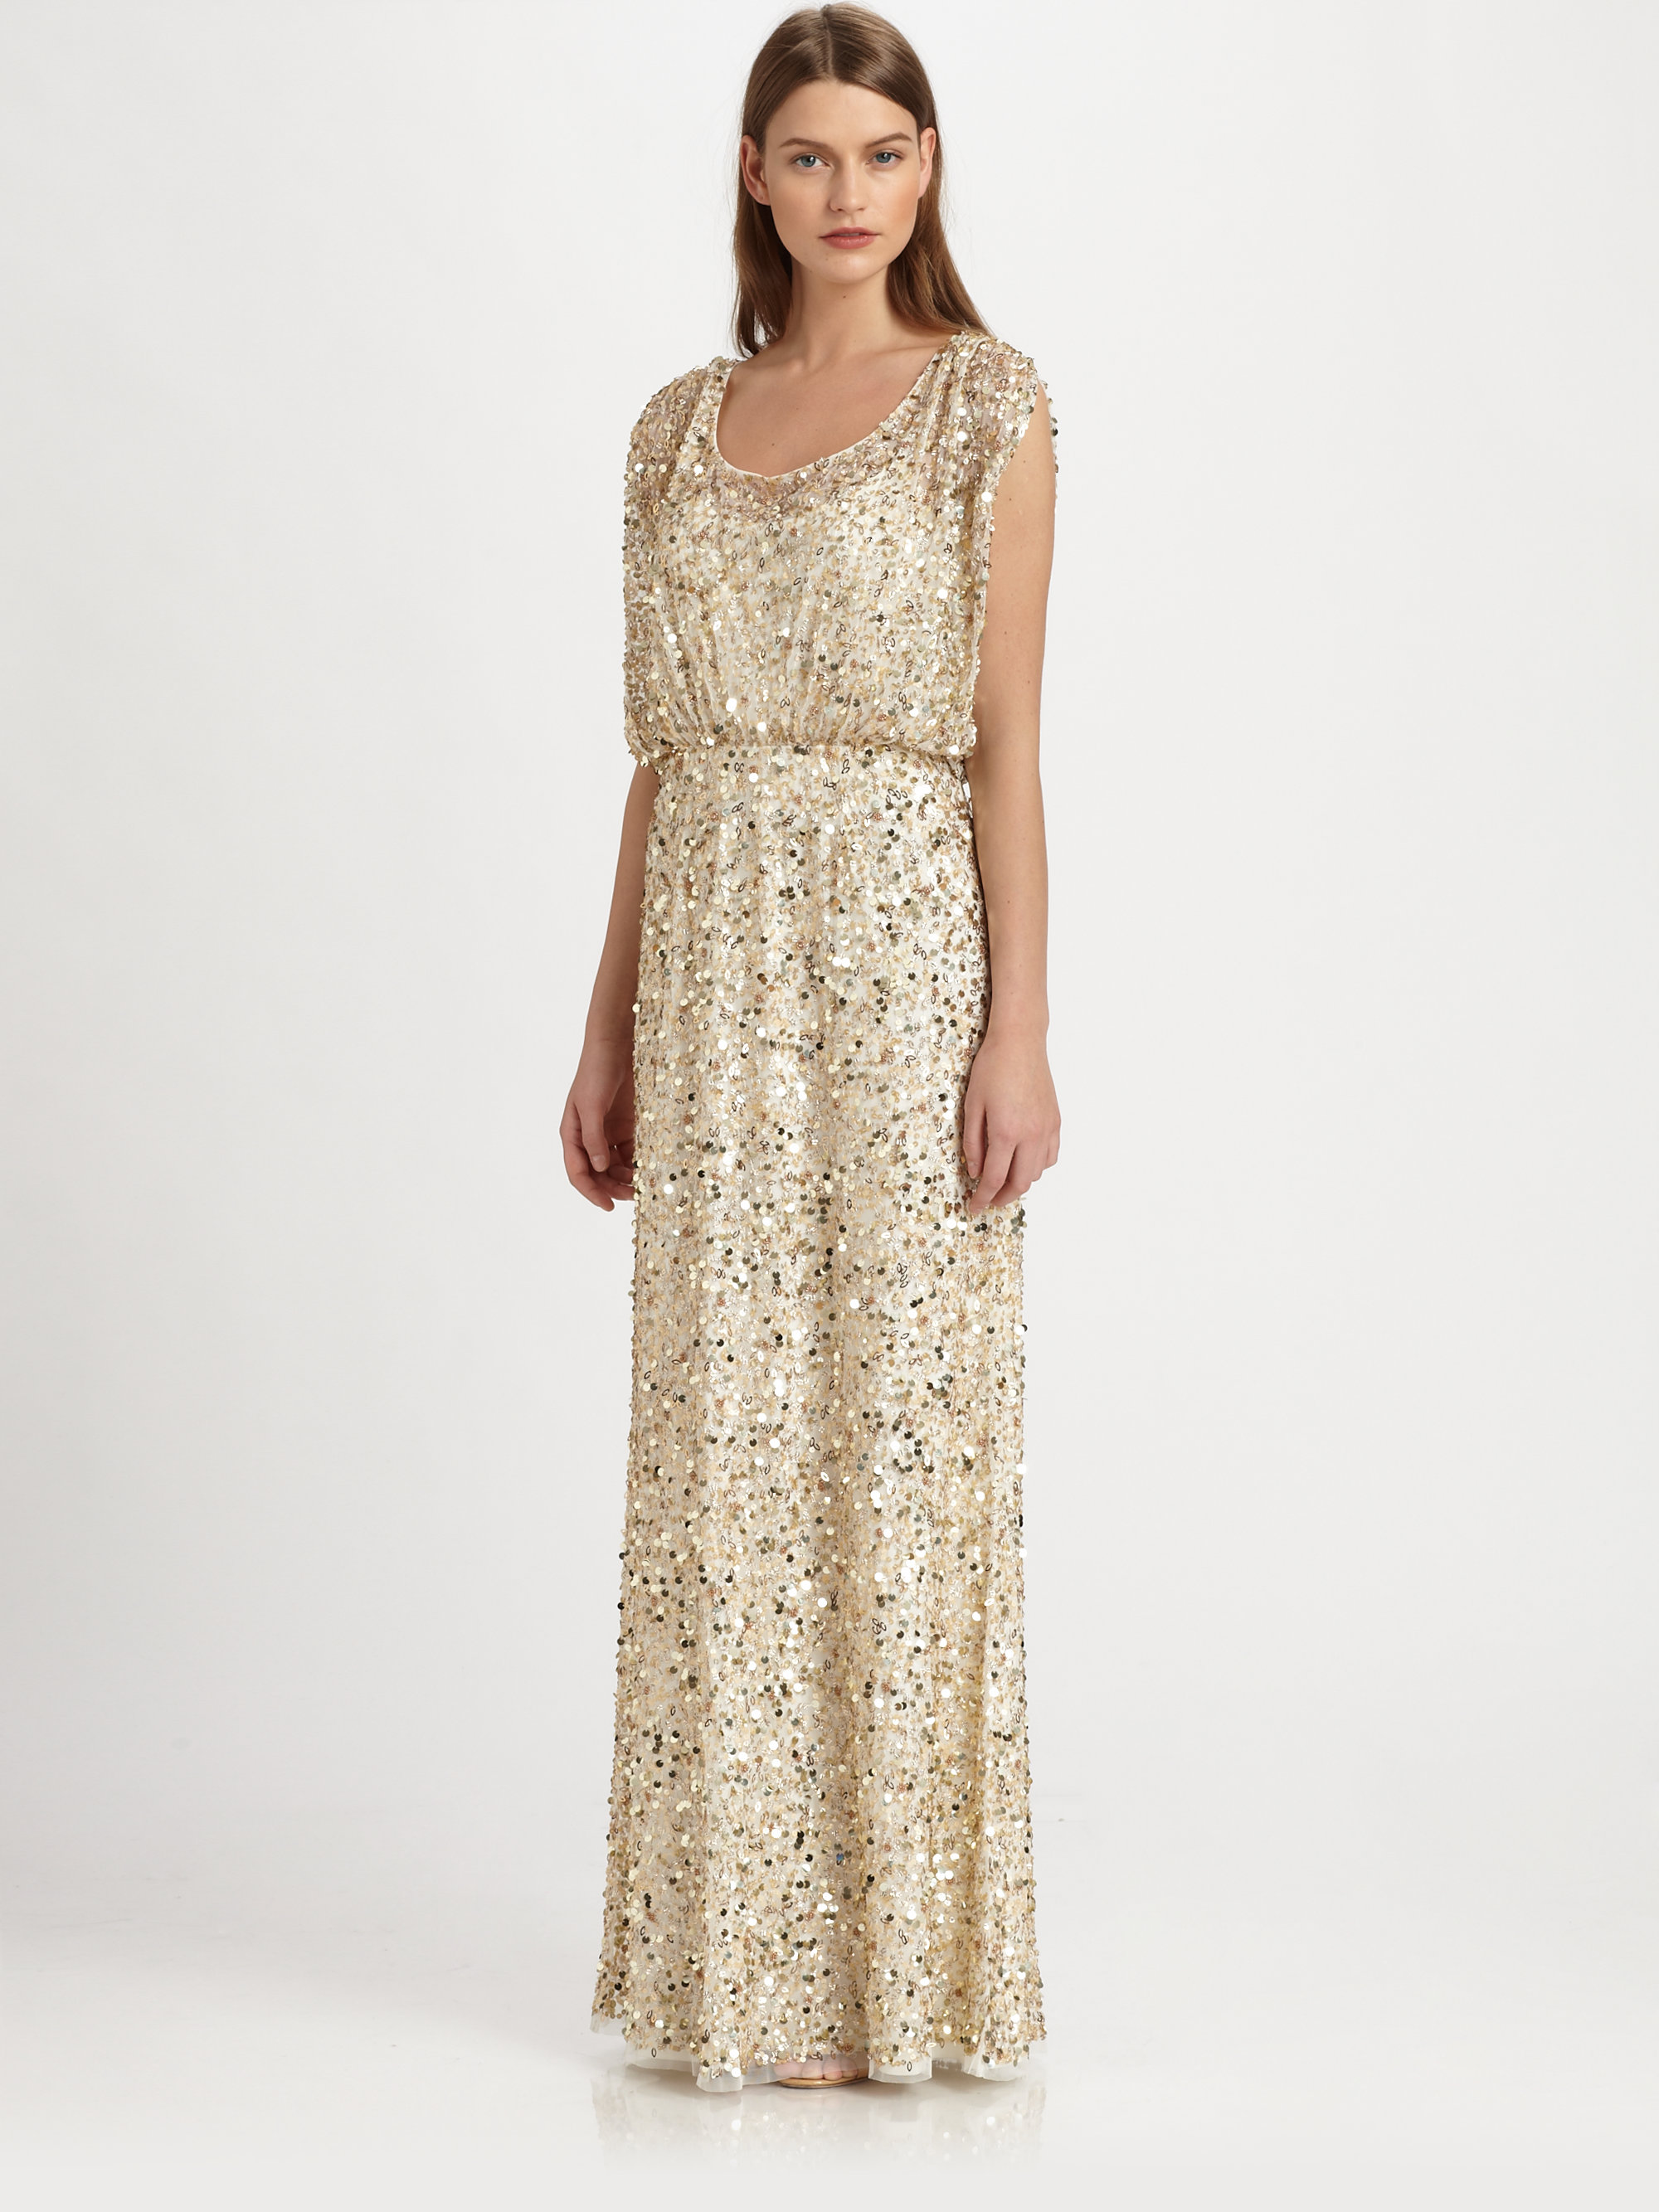 Lyst - Aidan Mattox Sequined Gown in Metallic